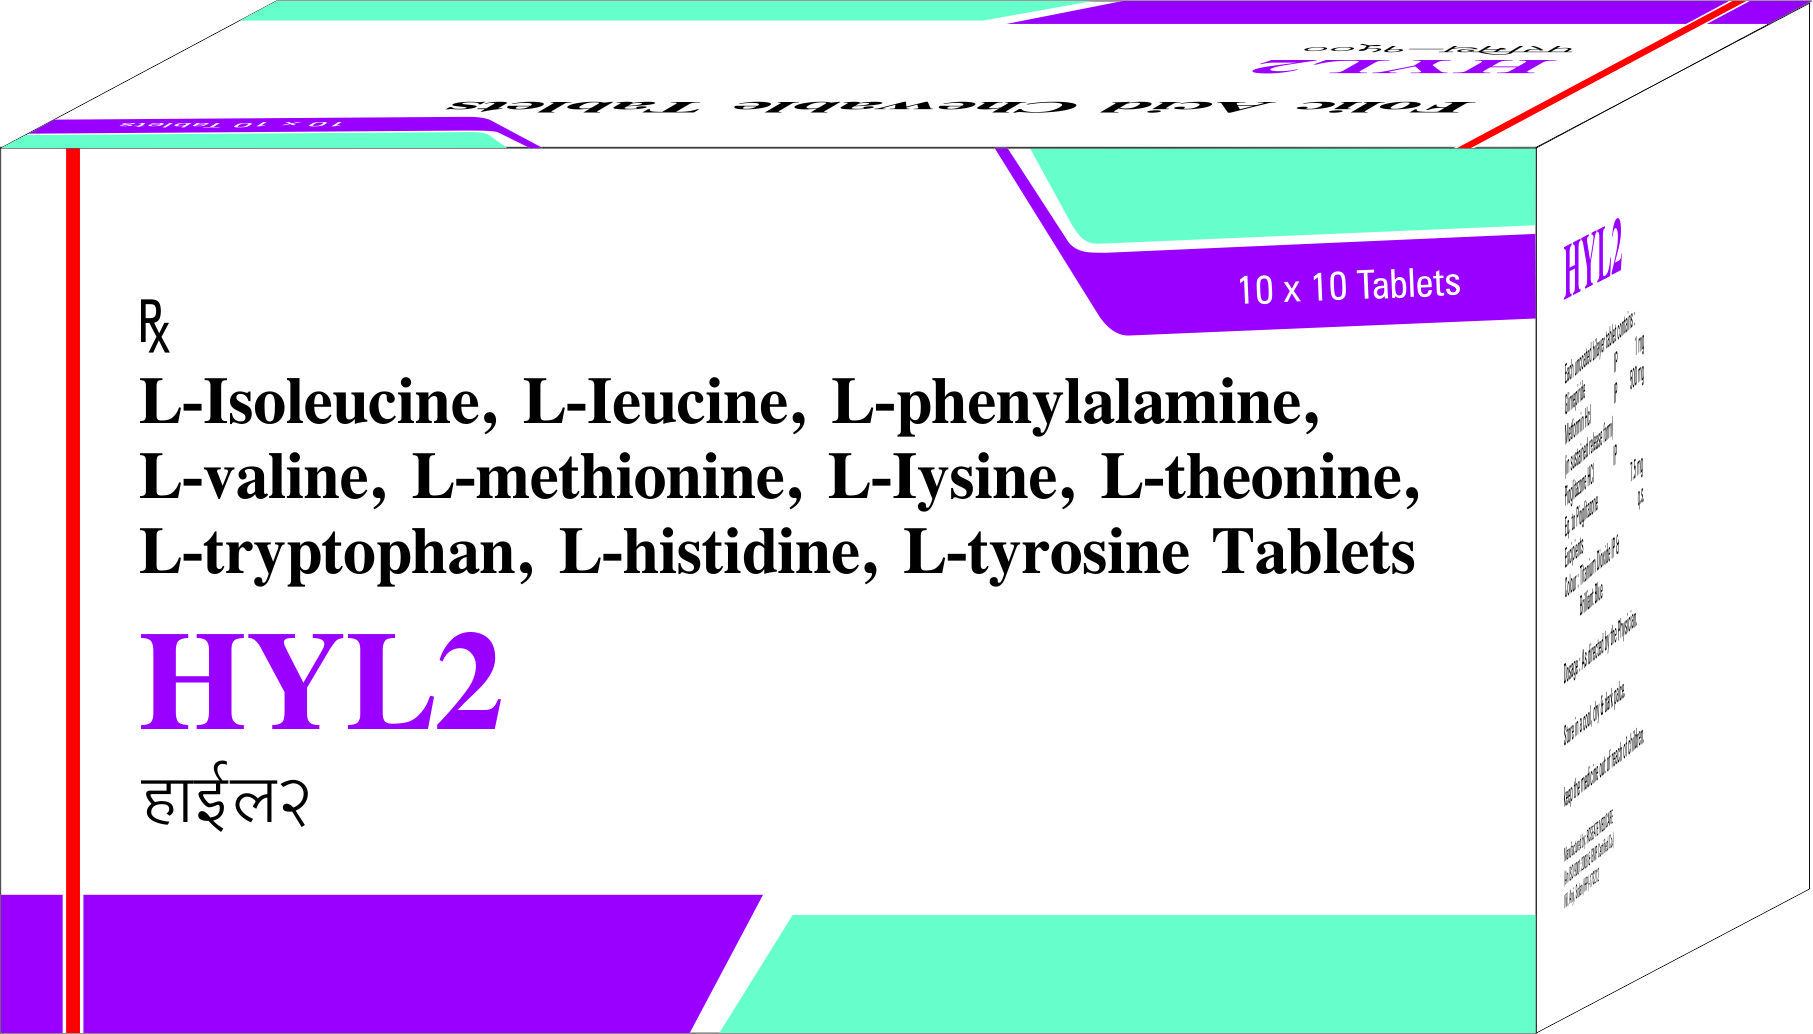 L-isolusine tab